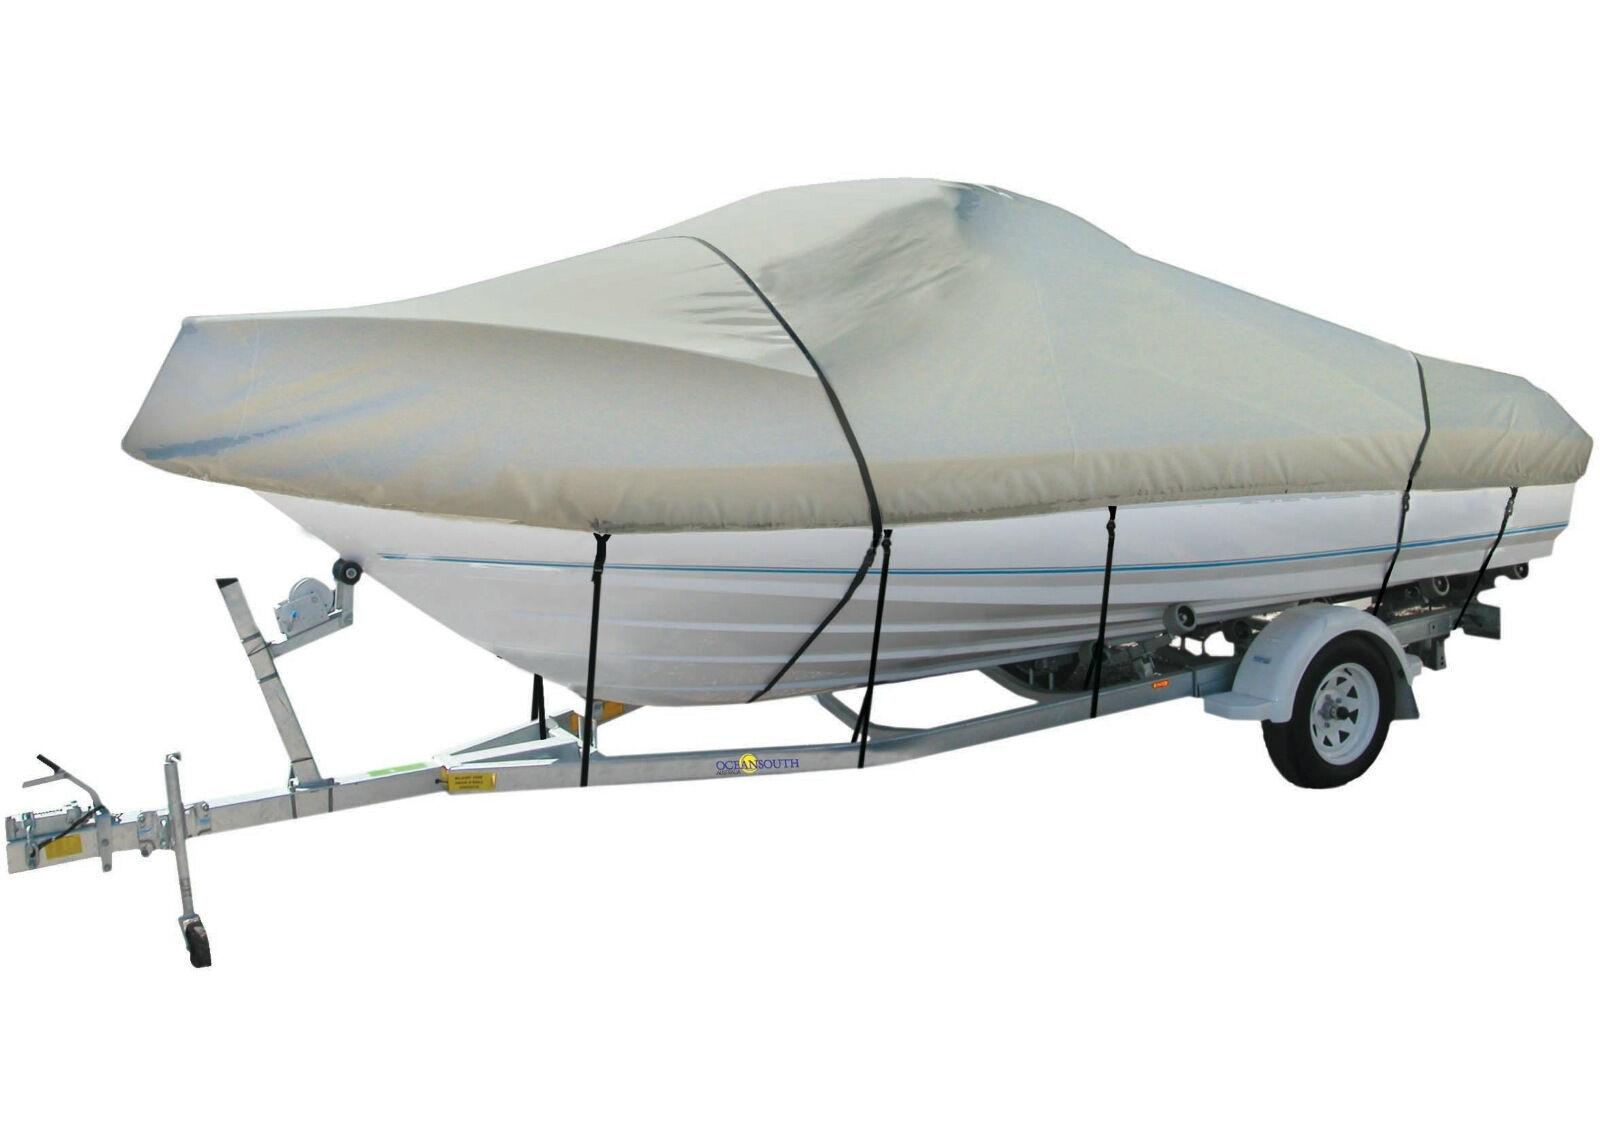 OceanSouth Venepeite Cabin Cruiser tyyppisille veneille 5.3-5.6 m